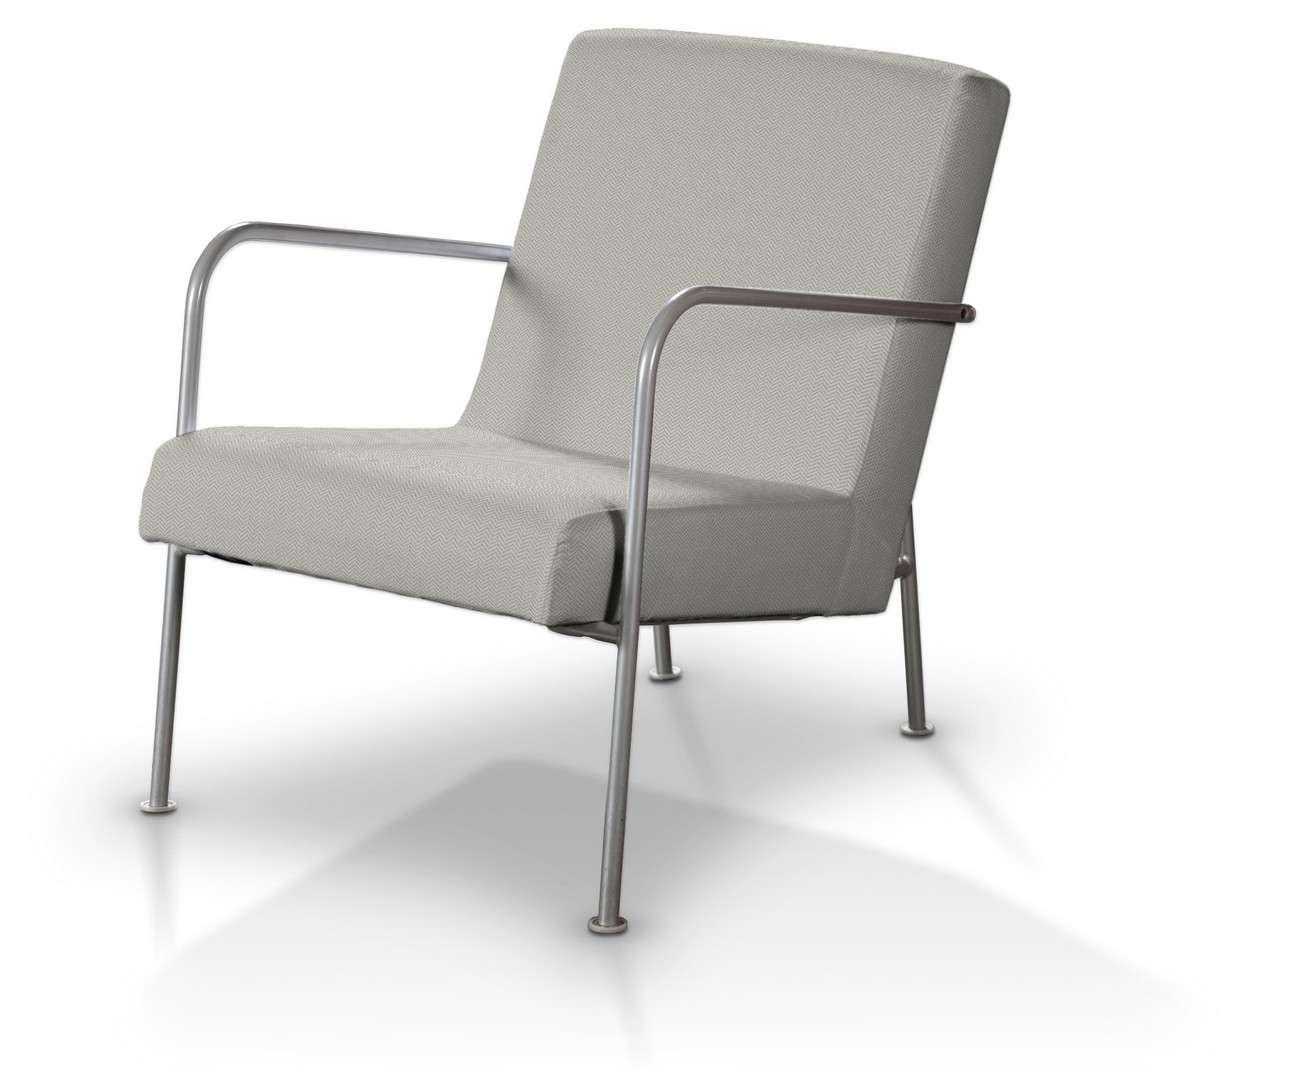 Pokrowiec na fotel Ikea PS w kolekcji Bergen, tkanina: 161-84